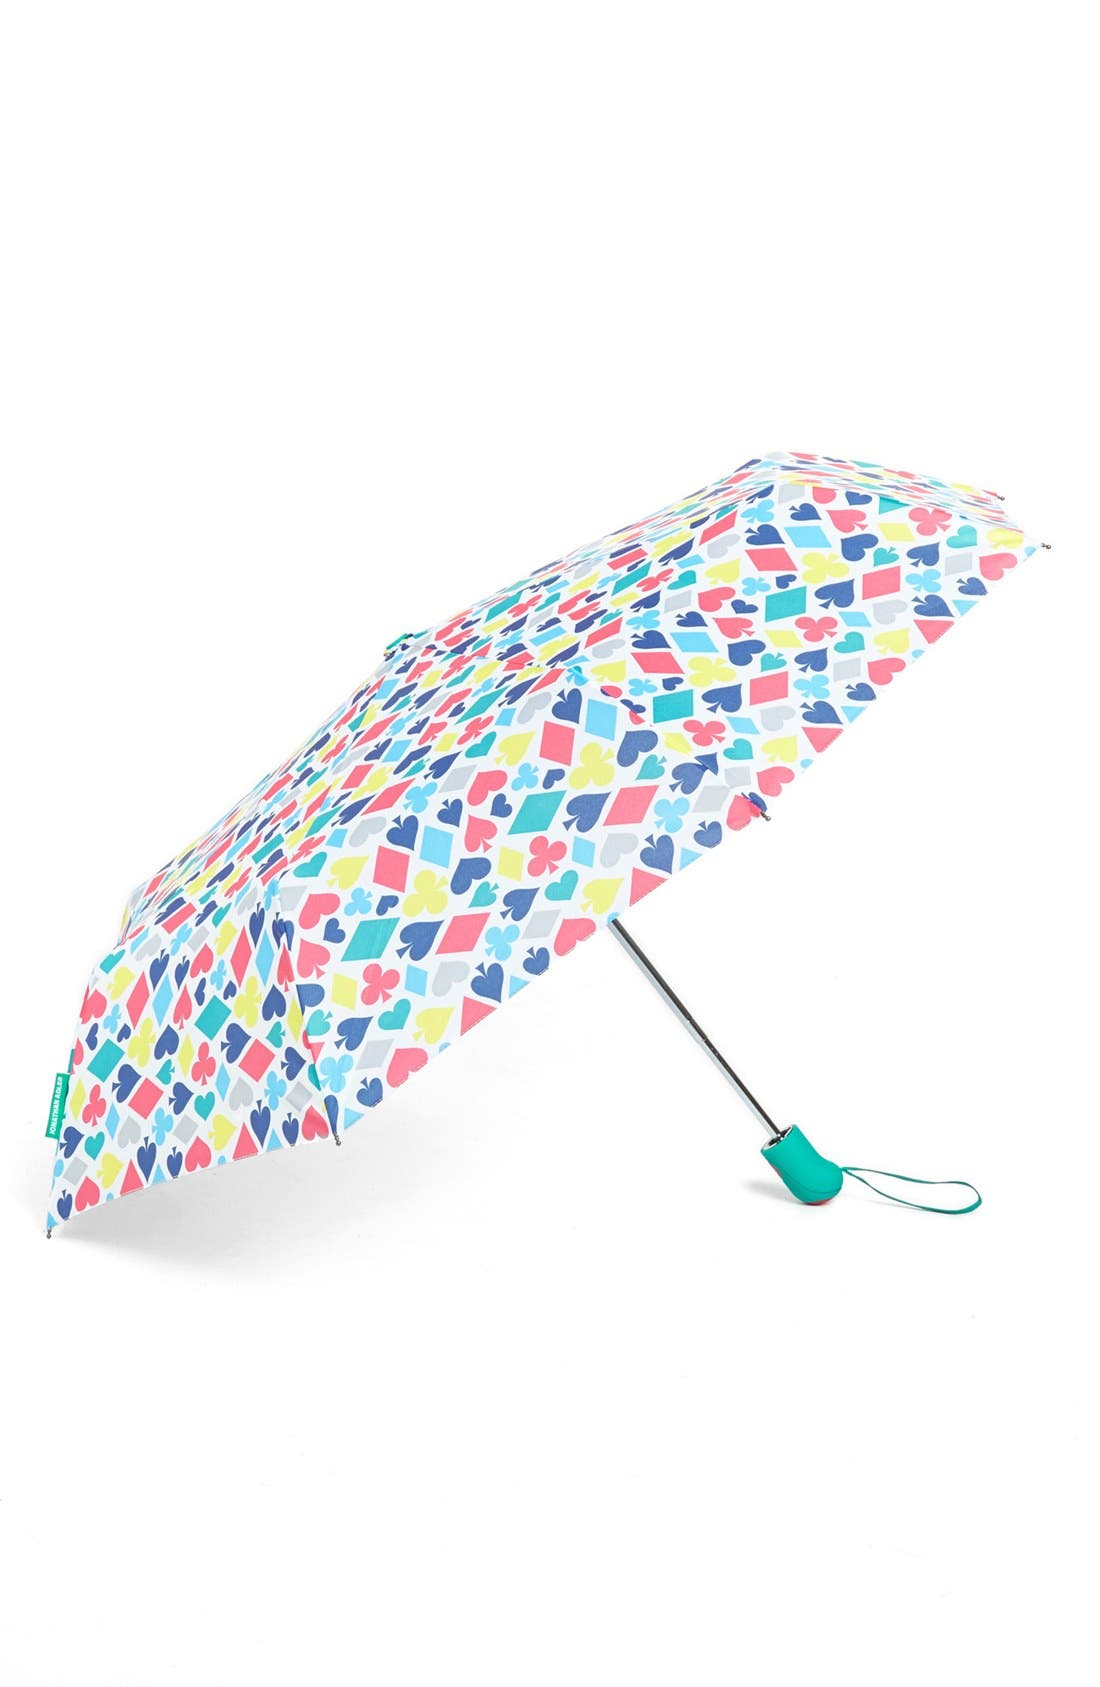 'House of Cards' Umbrella,                             Main thumbnail 1, color,                             100